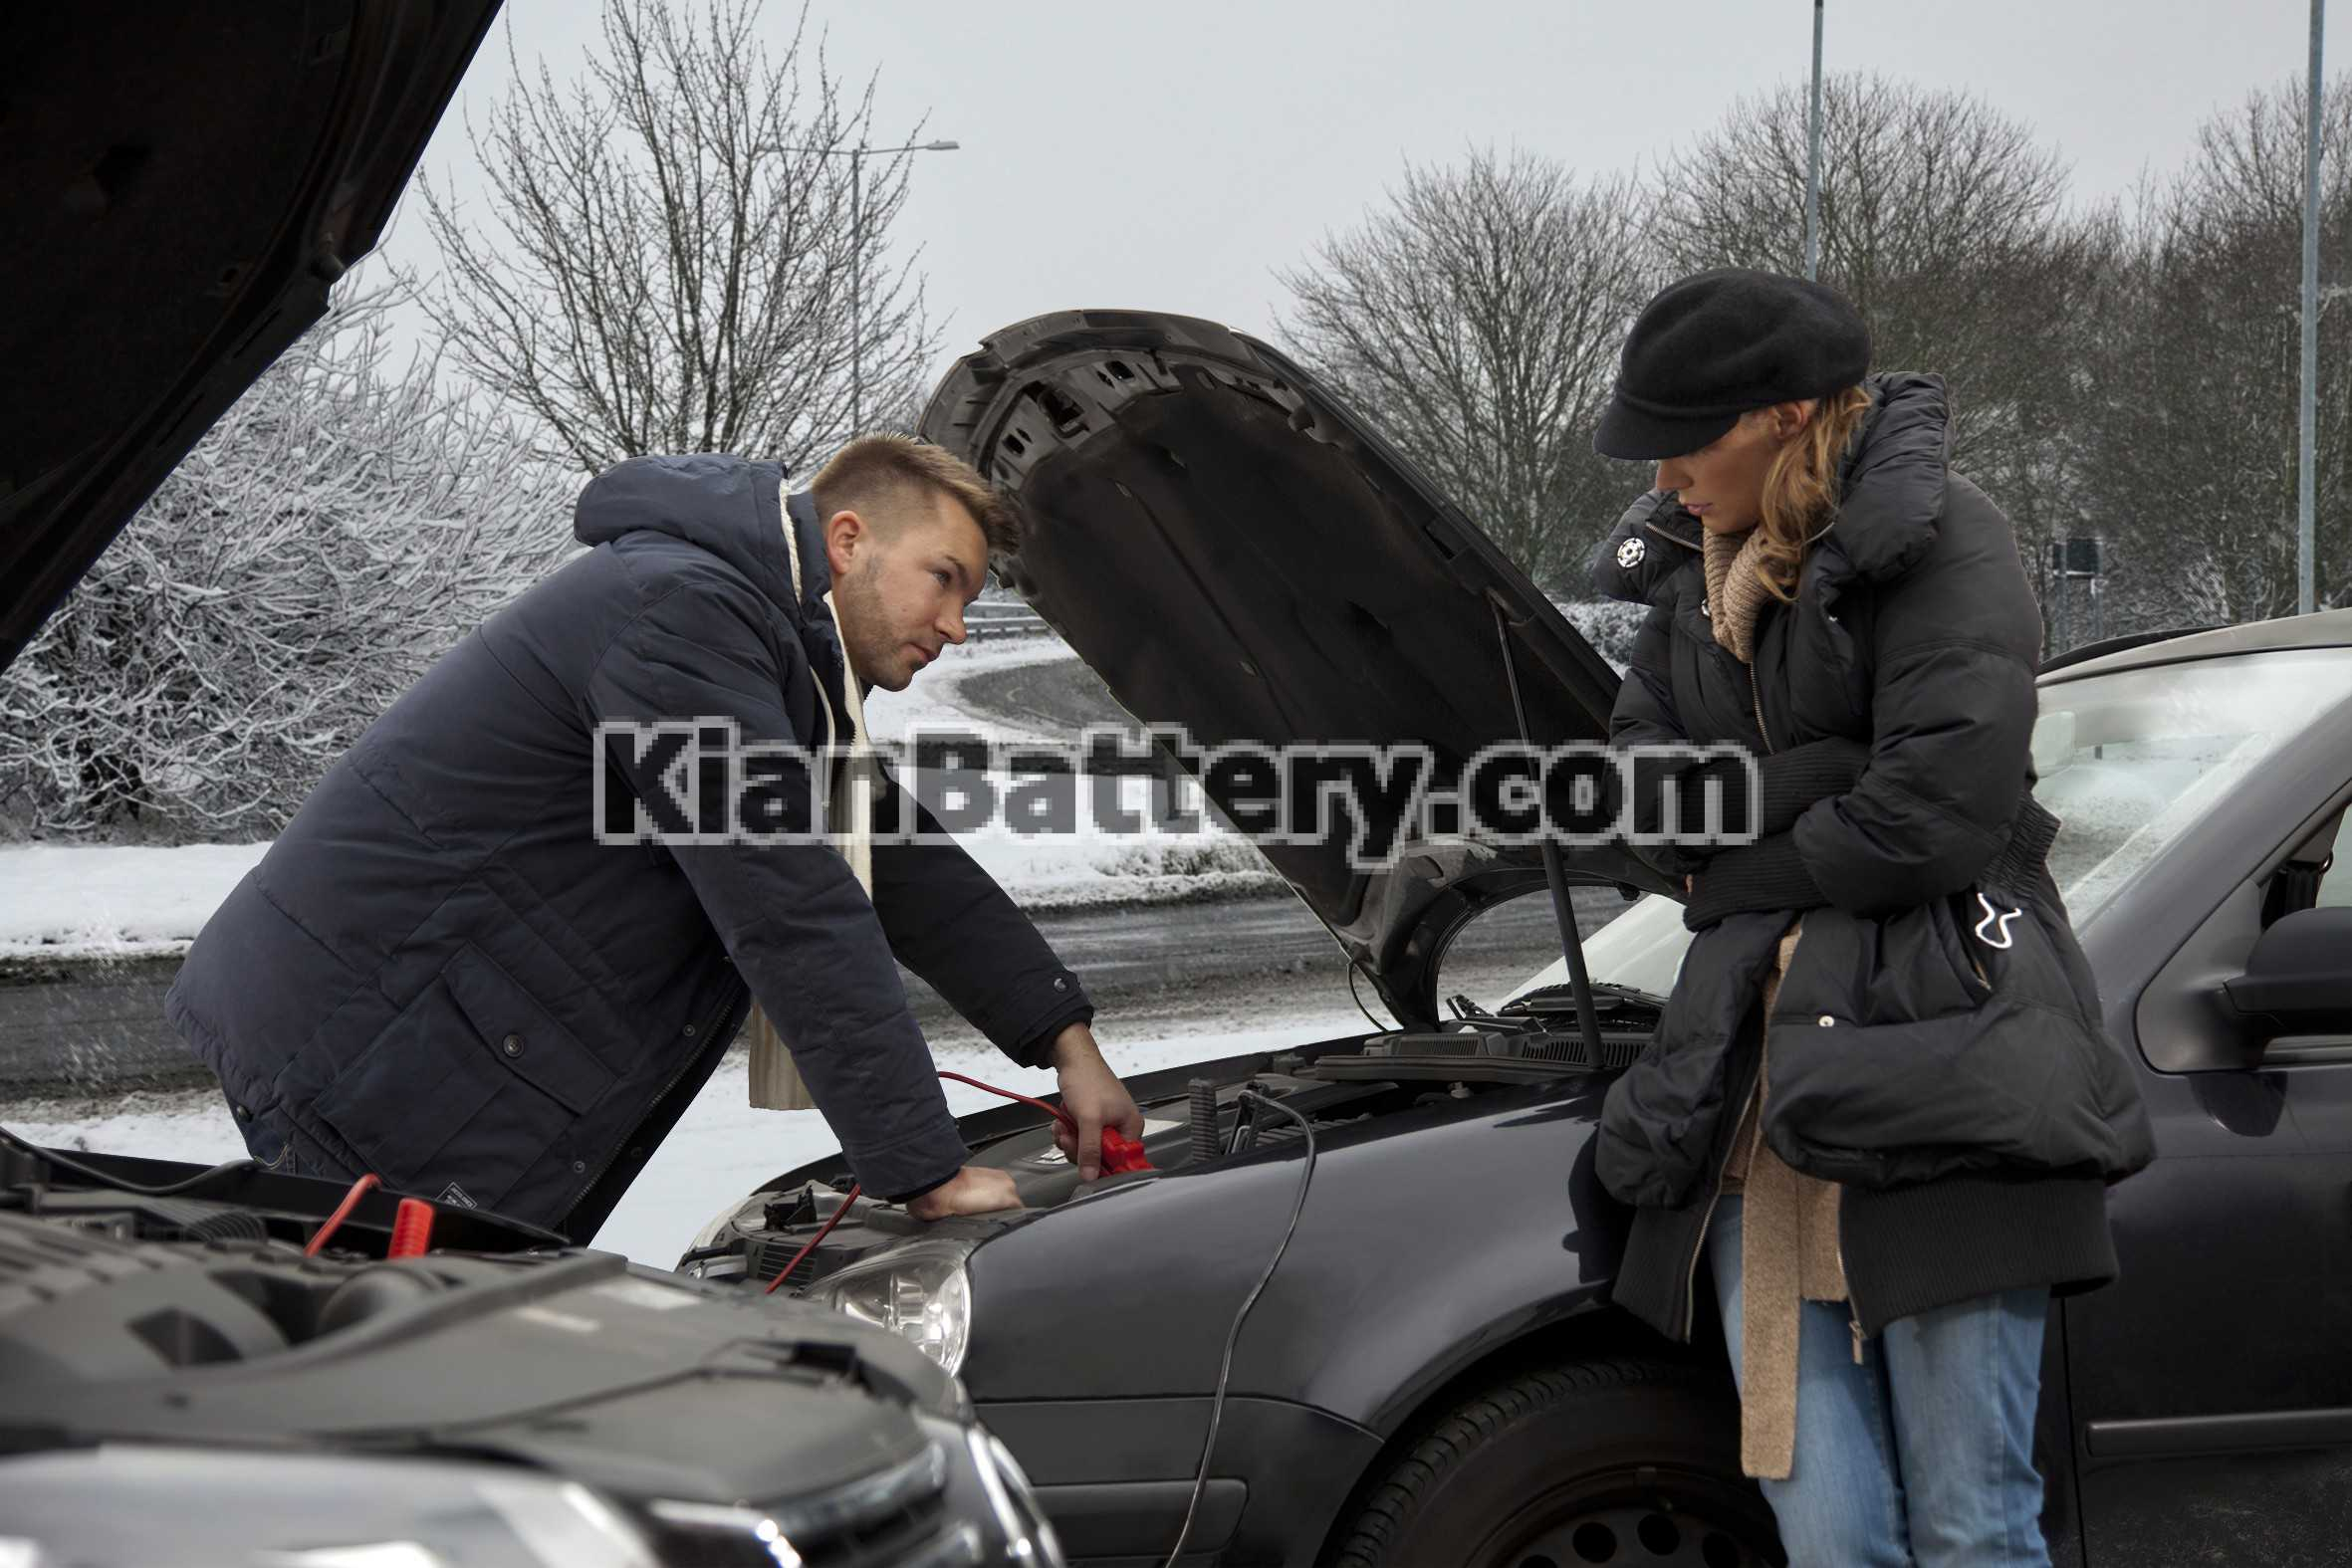 Green Flag Battery Credit Varta 2 علت خاموش شدن ناگهانی خودرو چیست؟